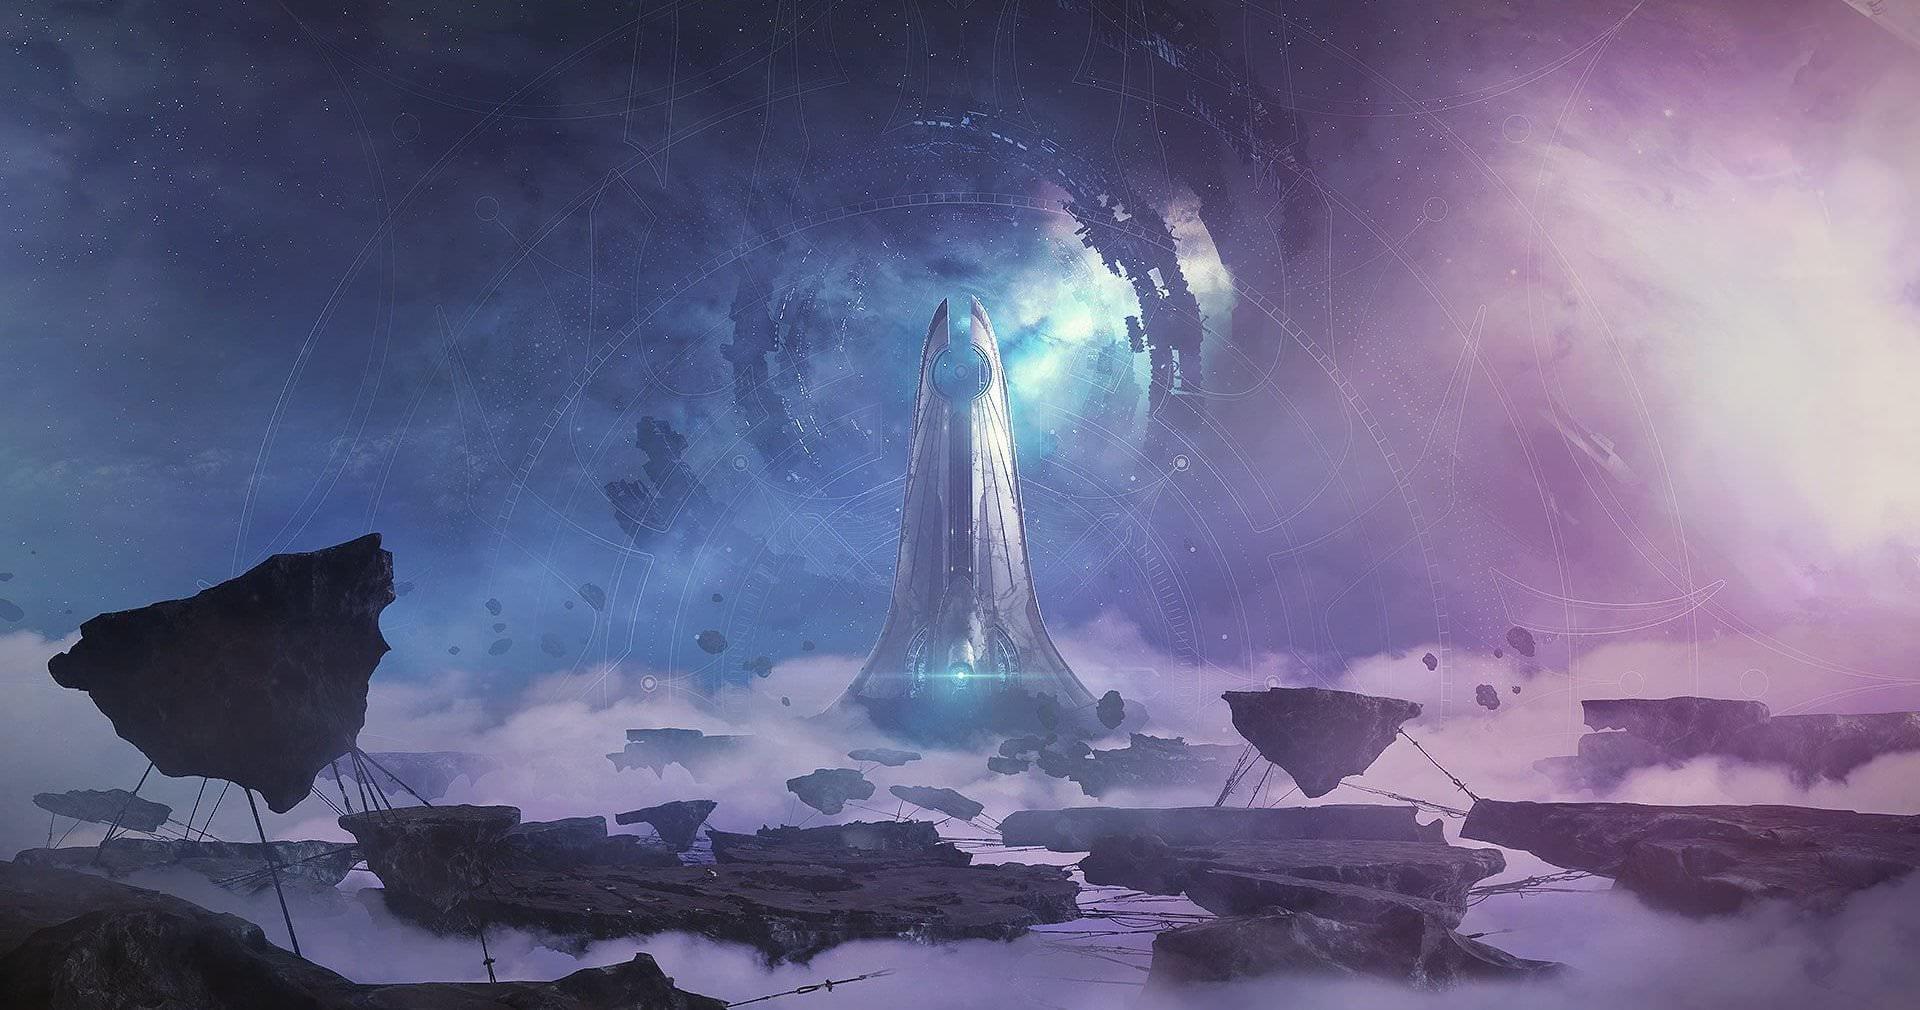 Destiny Destiny 2 Sky Night Wish 15 Destiny 2 798523 Hd Wallpaper Backgrounds Download